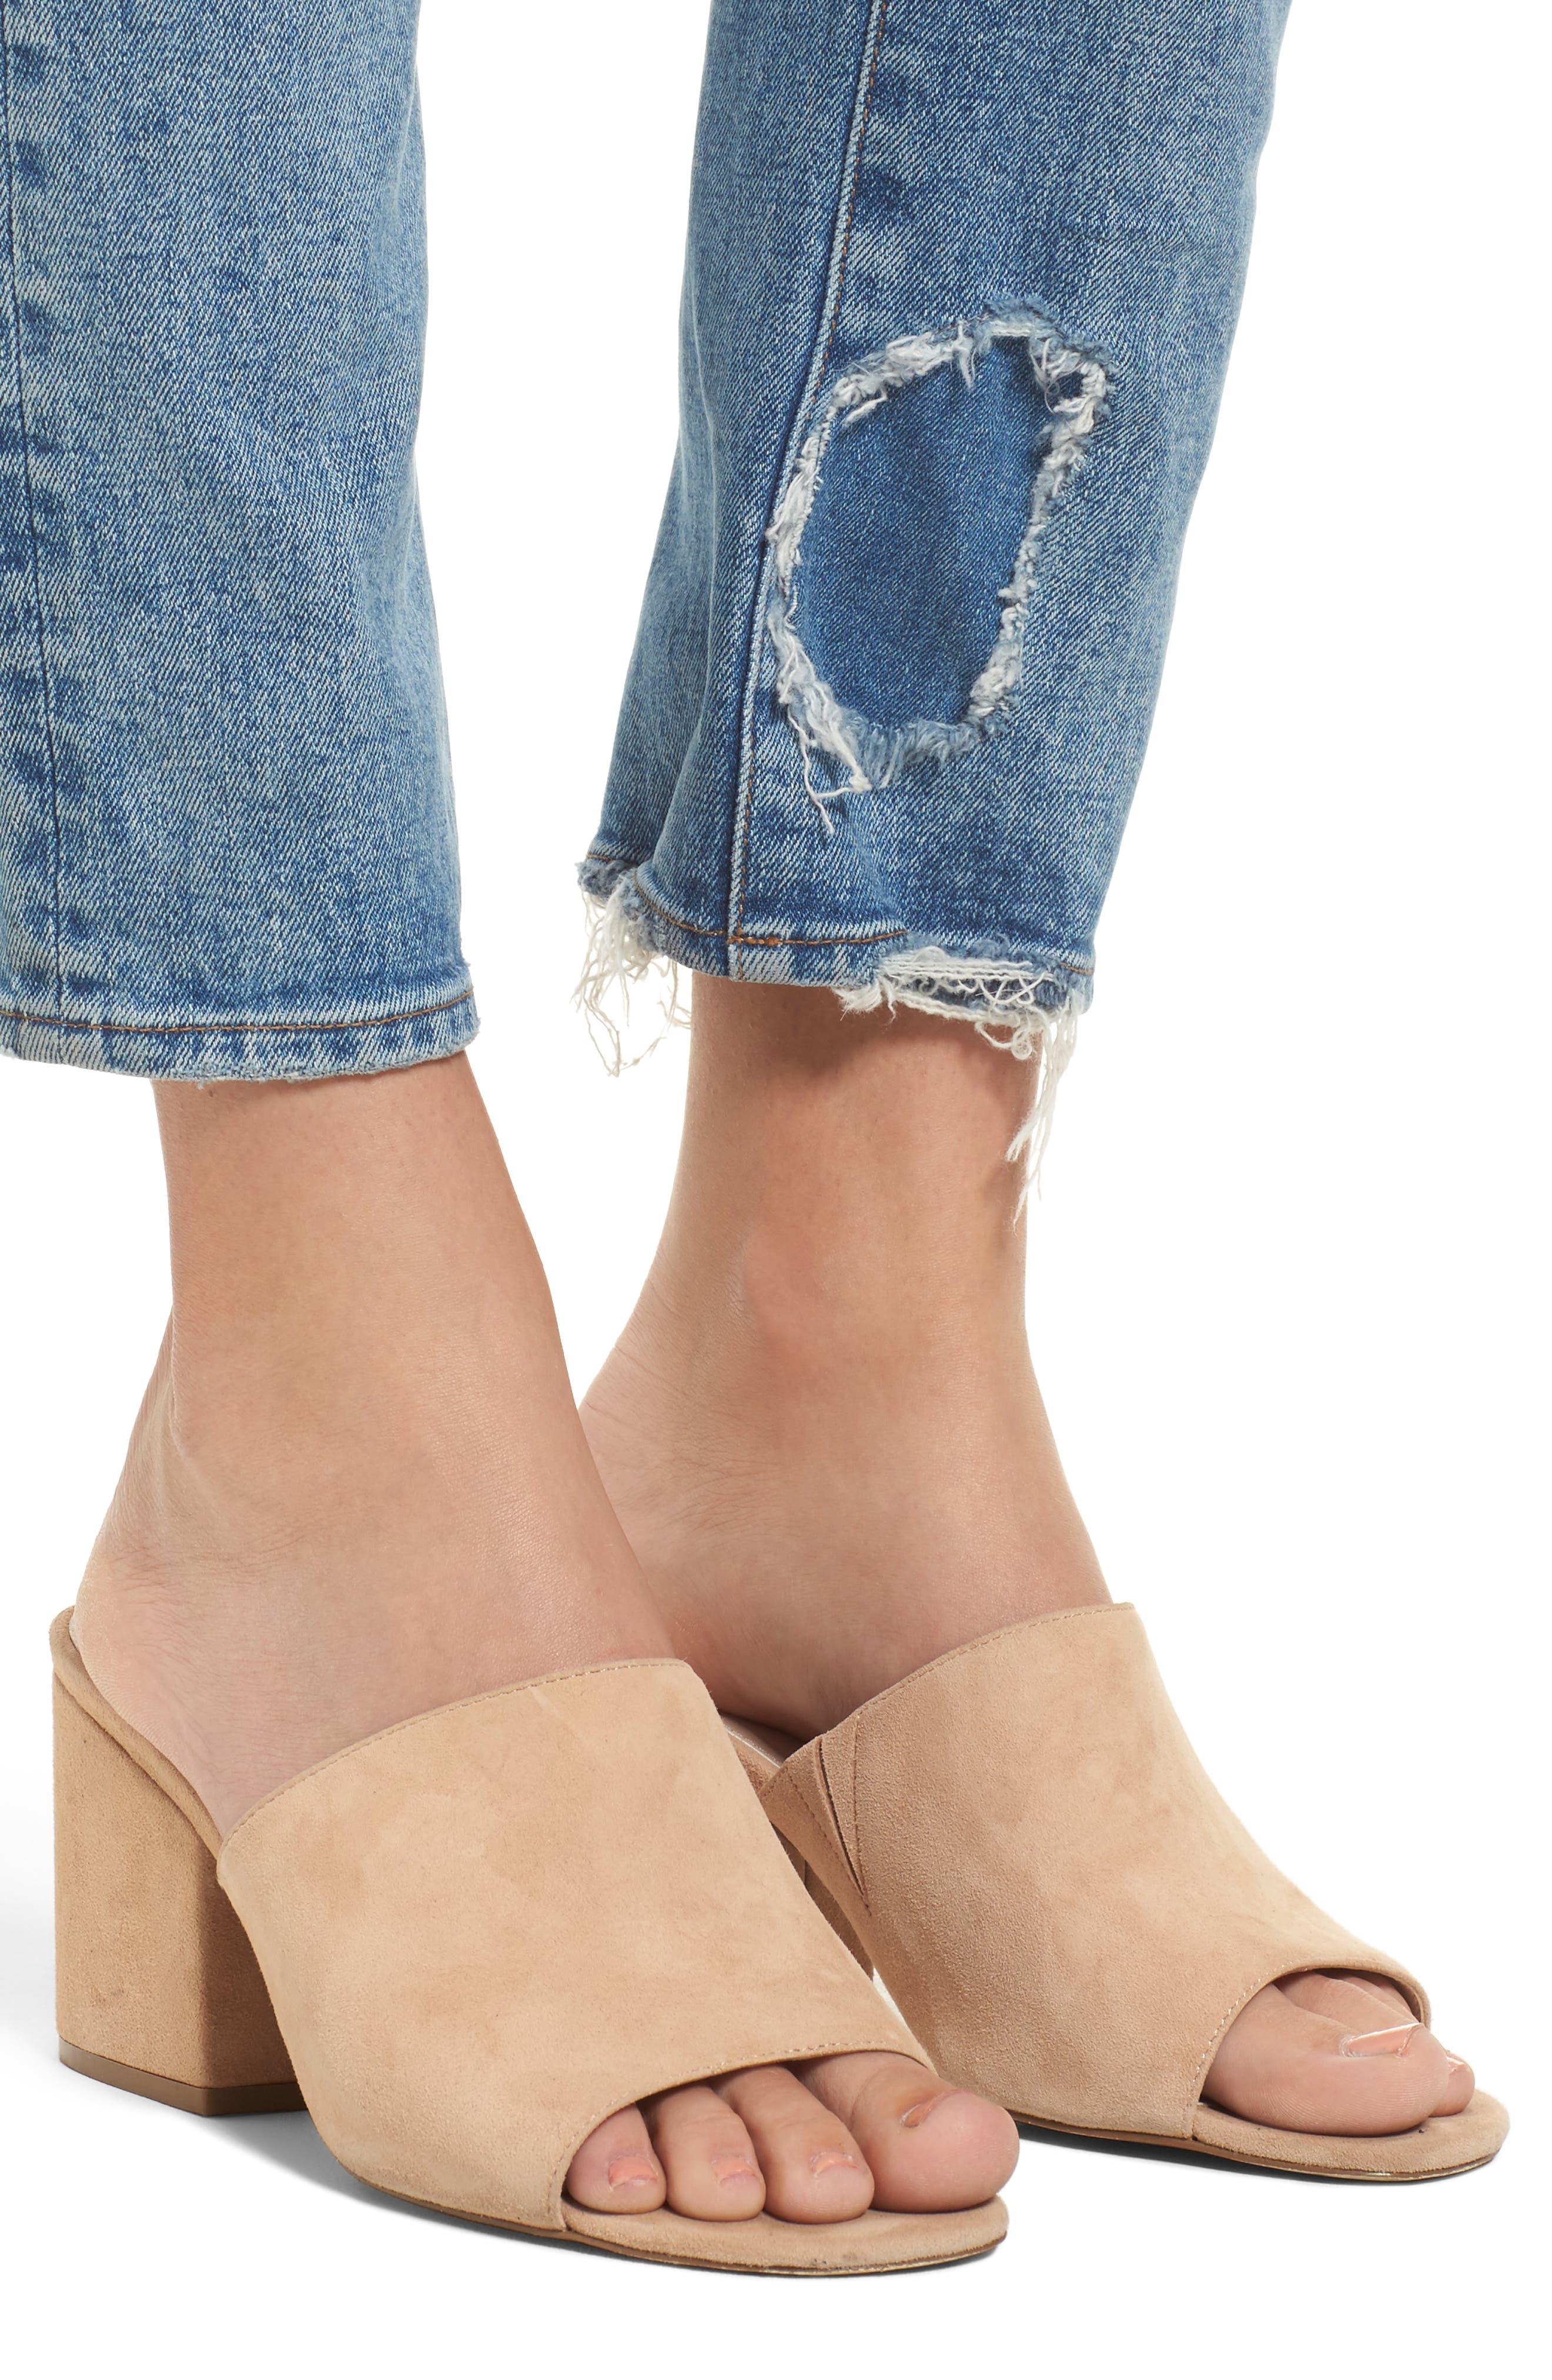 Bella Vintage Ankle Skinny Jeans,                             Alternate thumbnail 4, color,                             430